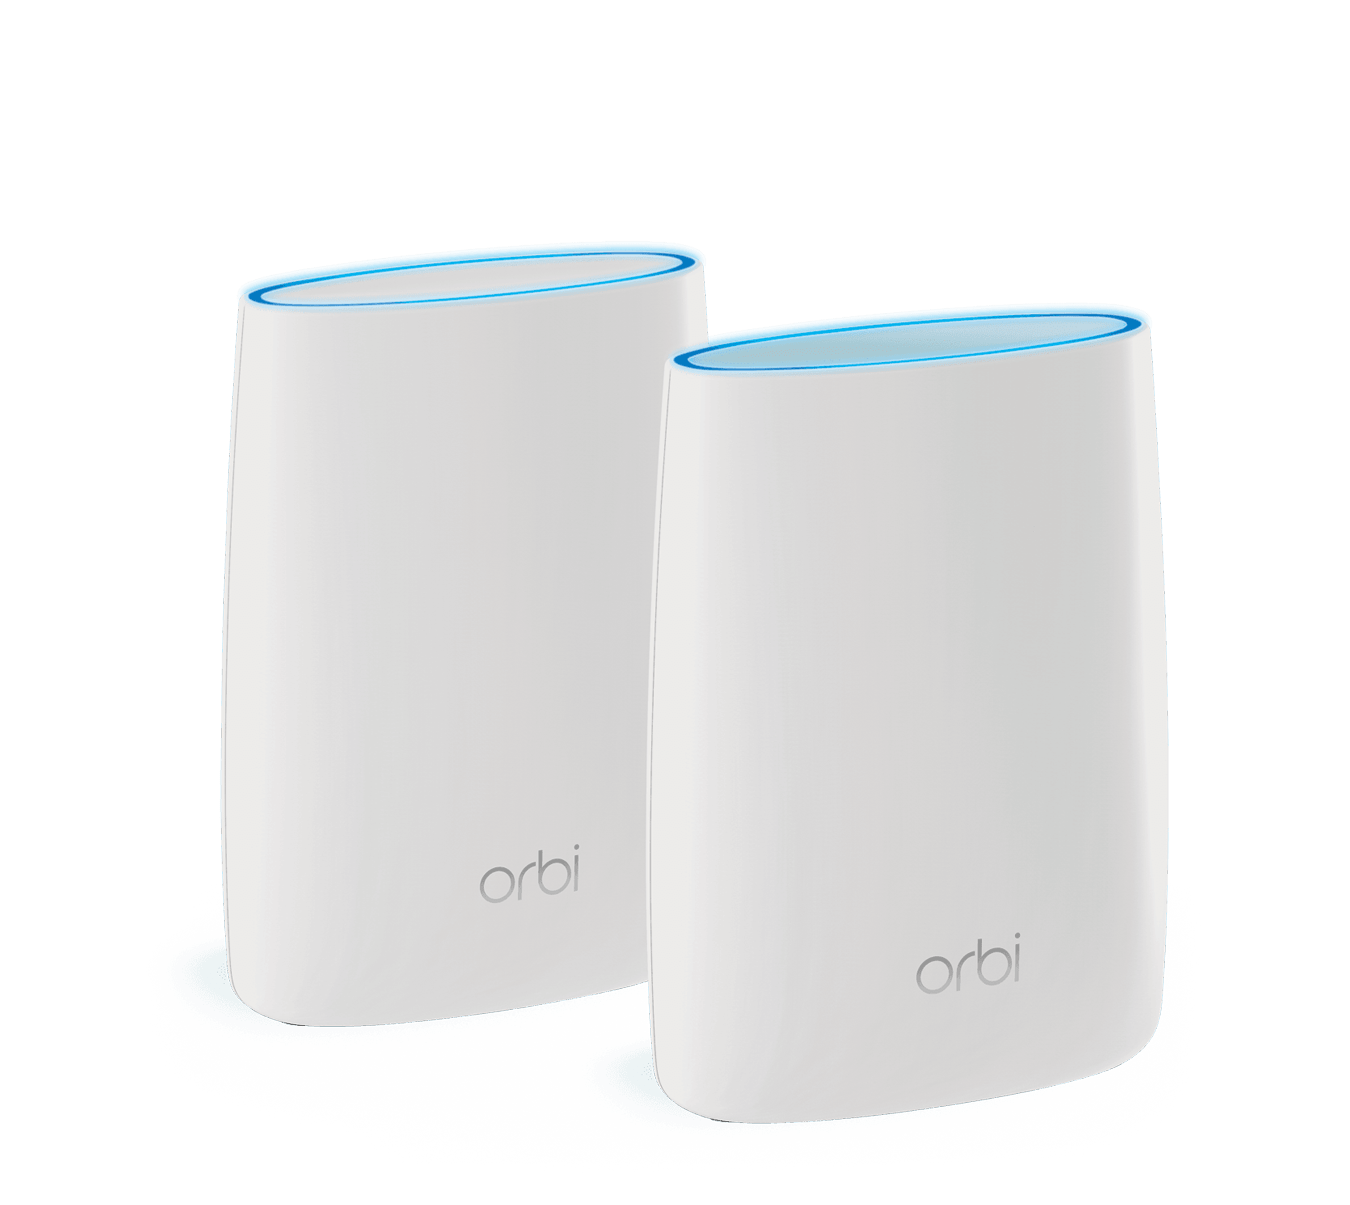 2-pack Orbi AC2200 Tri-Band Mesh Wi-Fi System NETGEAR